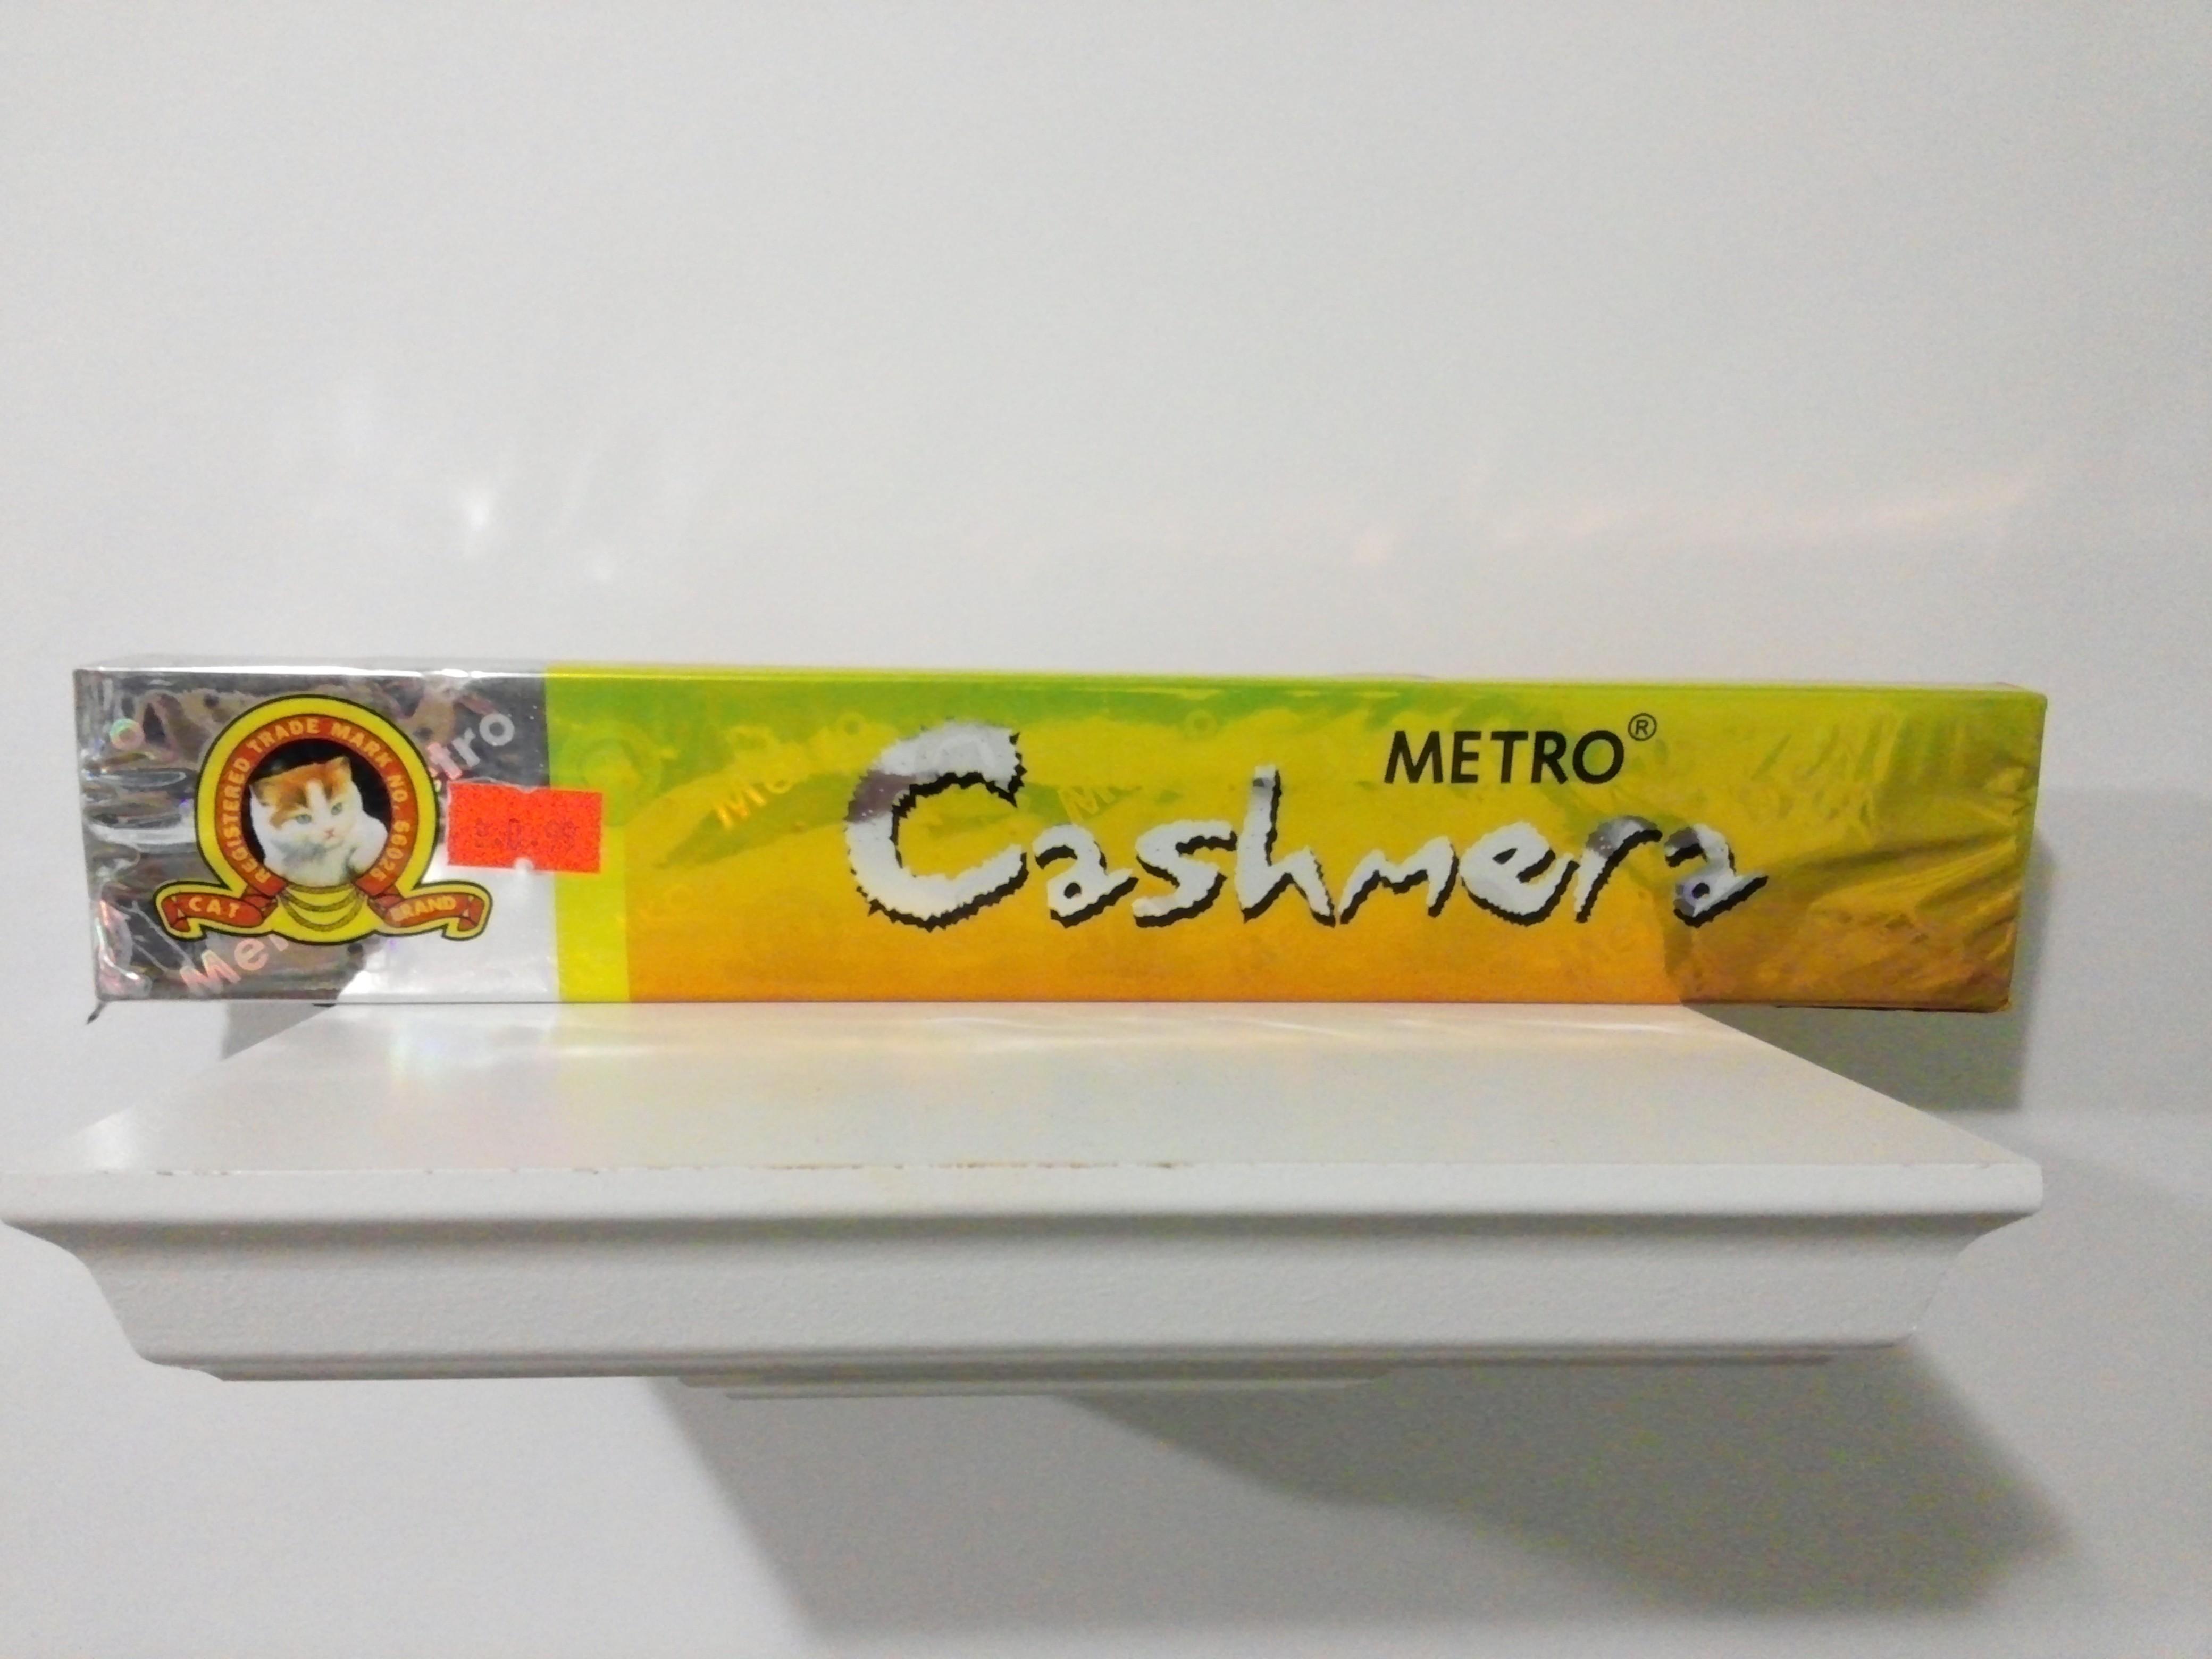 Metro Cashmera Agarbatti 1 Pack